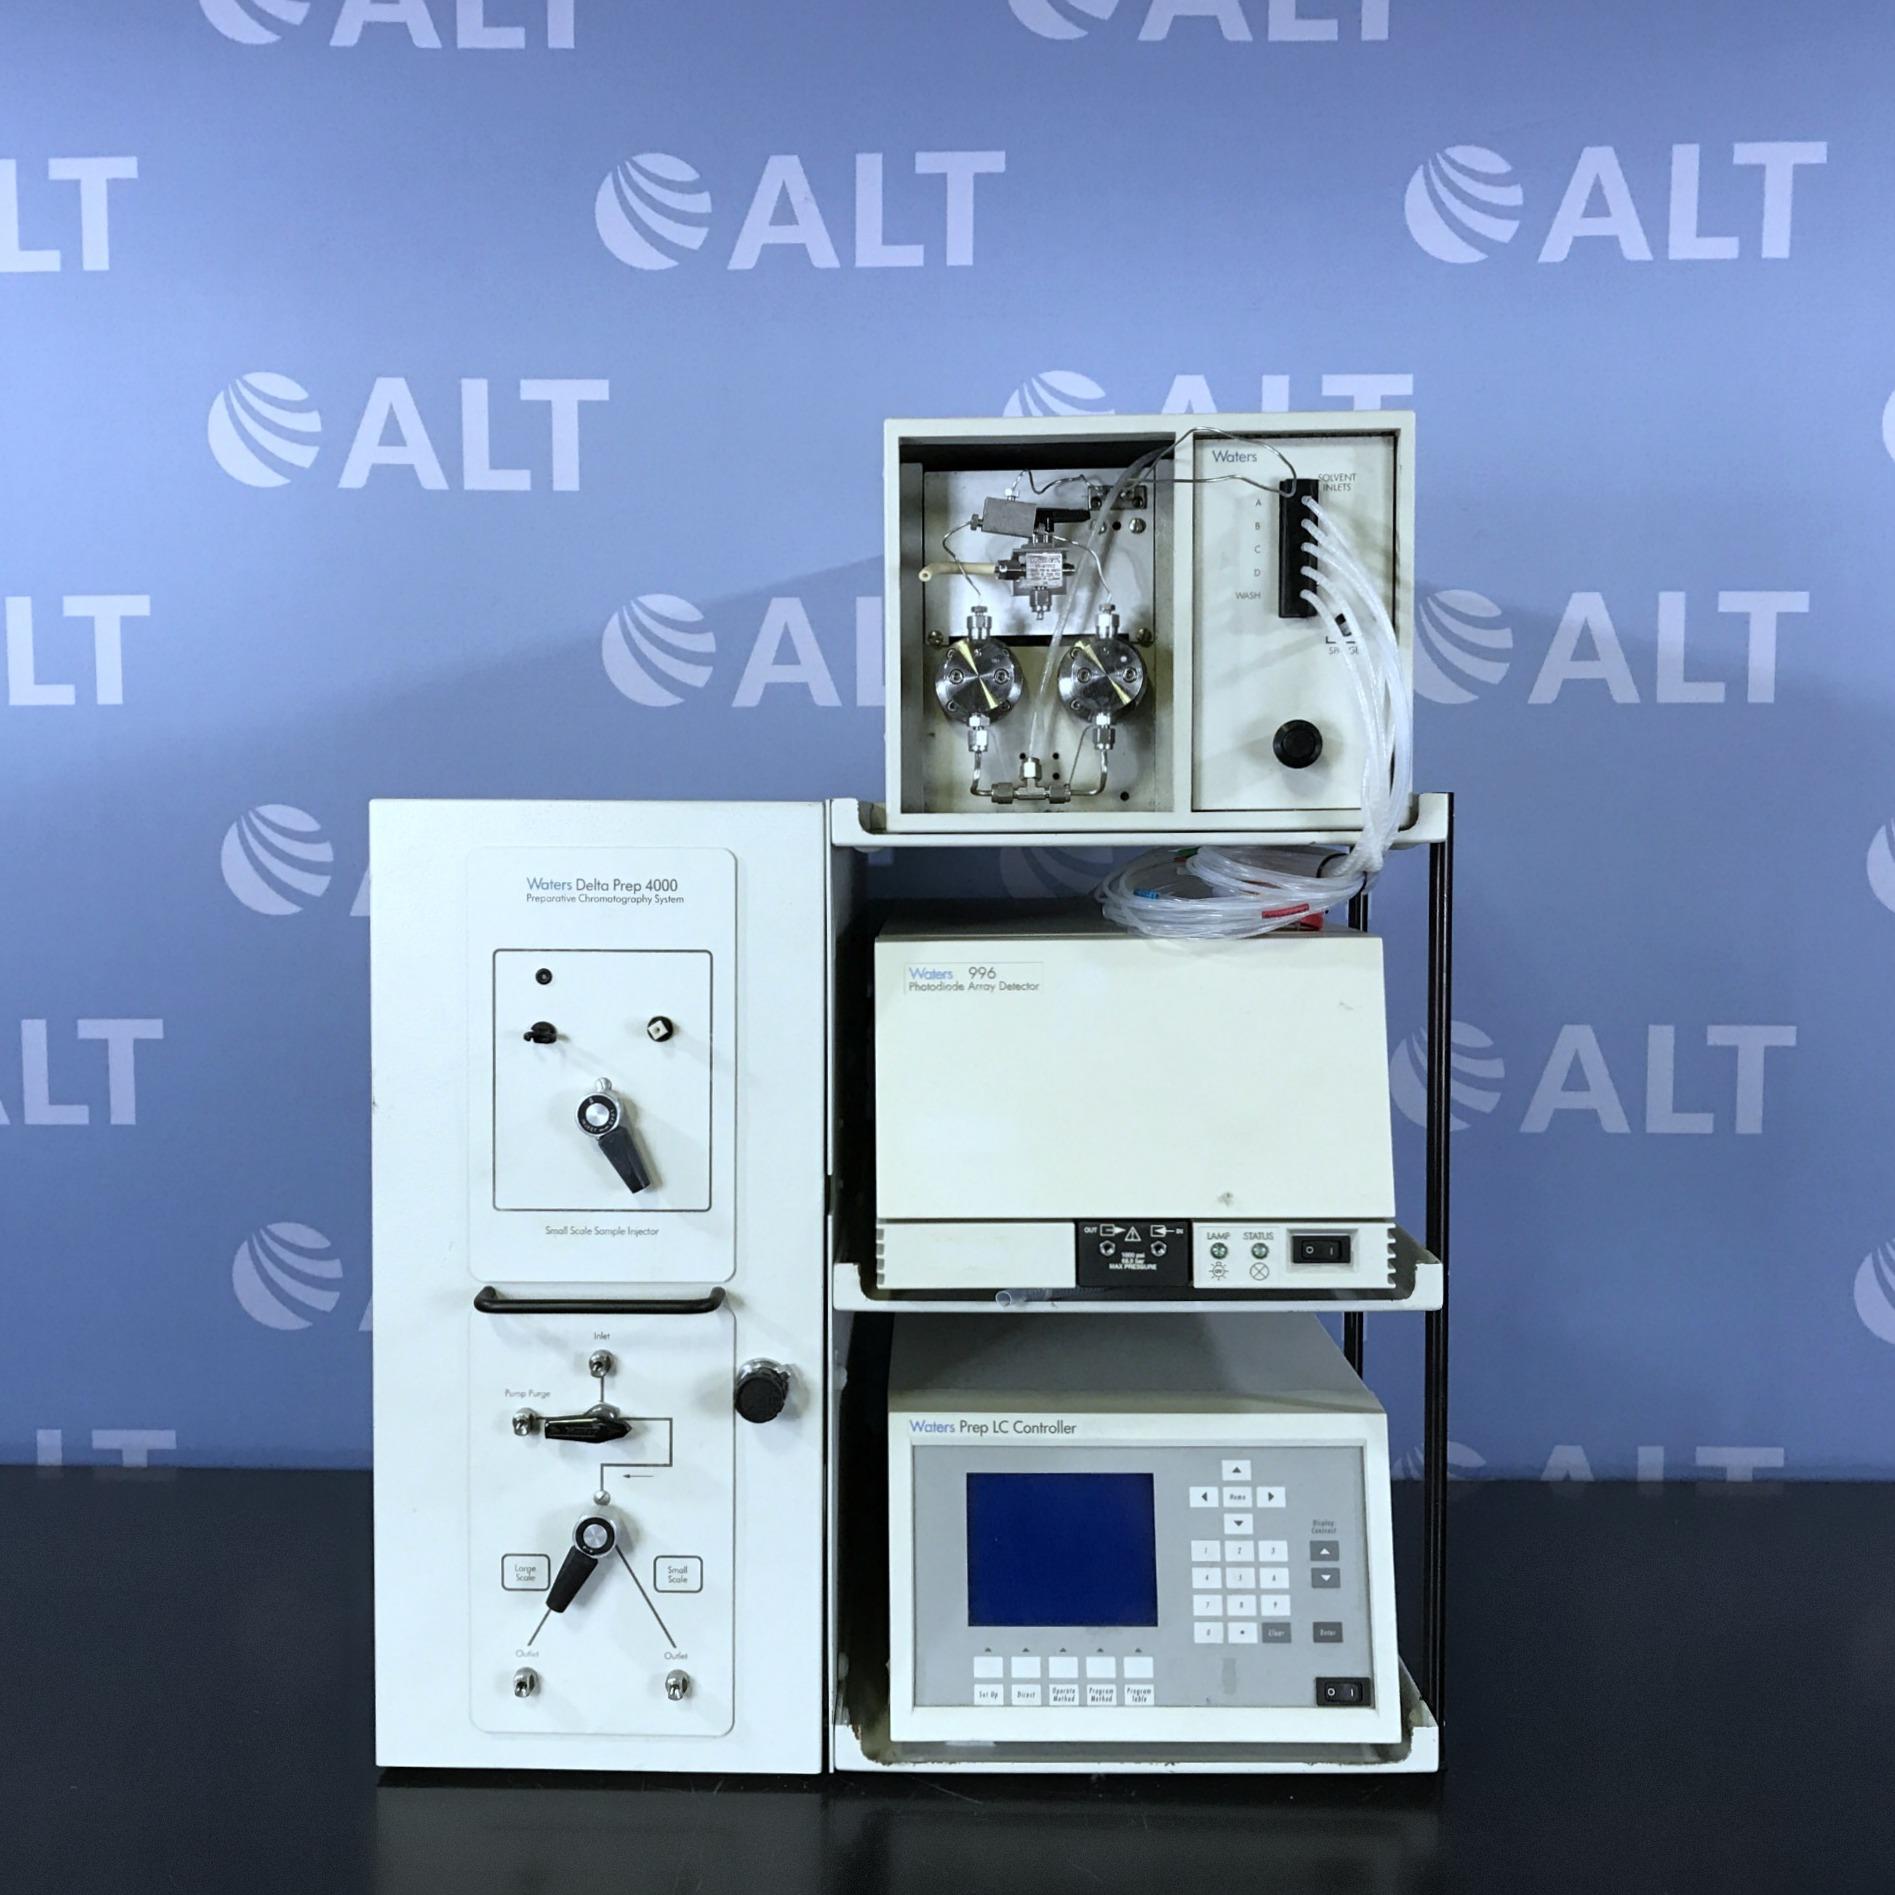 Waters Delta Prep 4000 Preparative Chromatography System Image